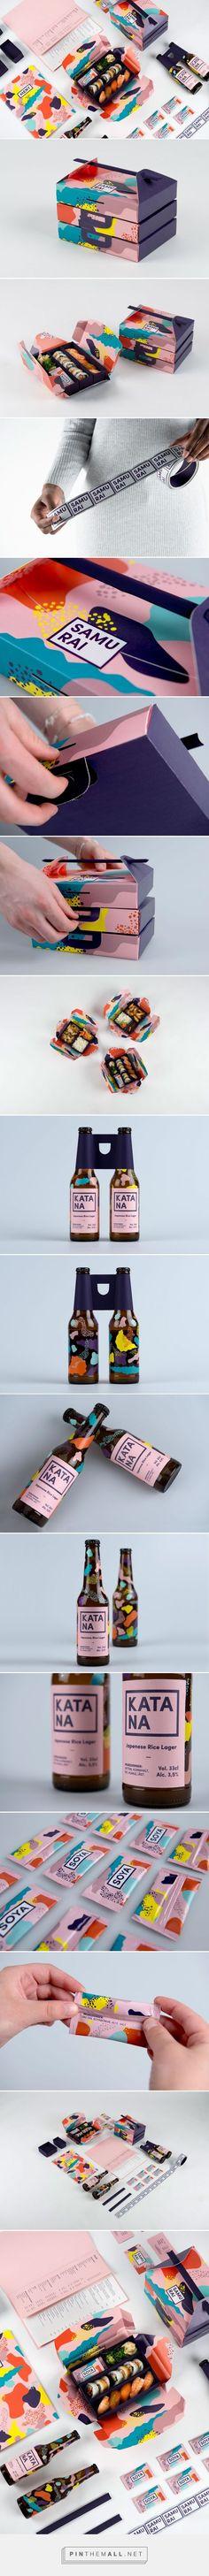 PACKAGING // colorful minimal clean design — collaborative design — explosive creative